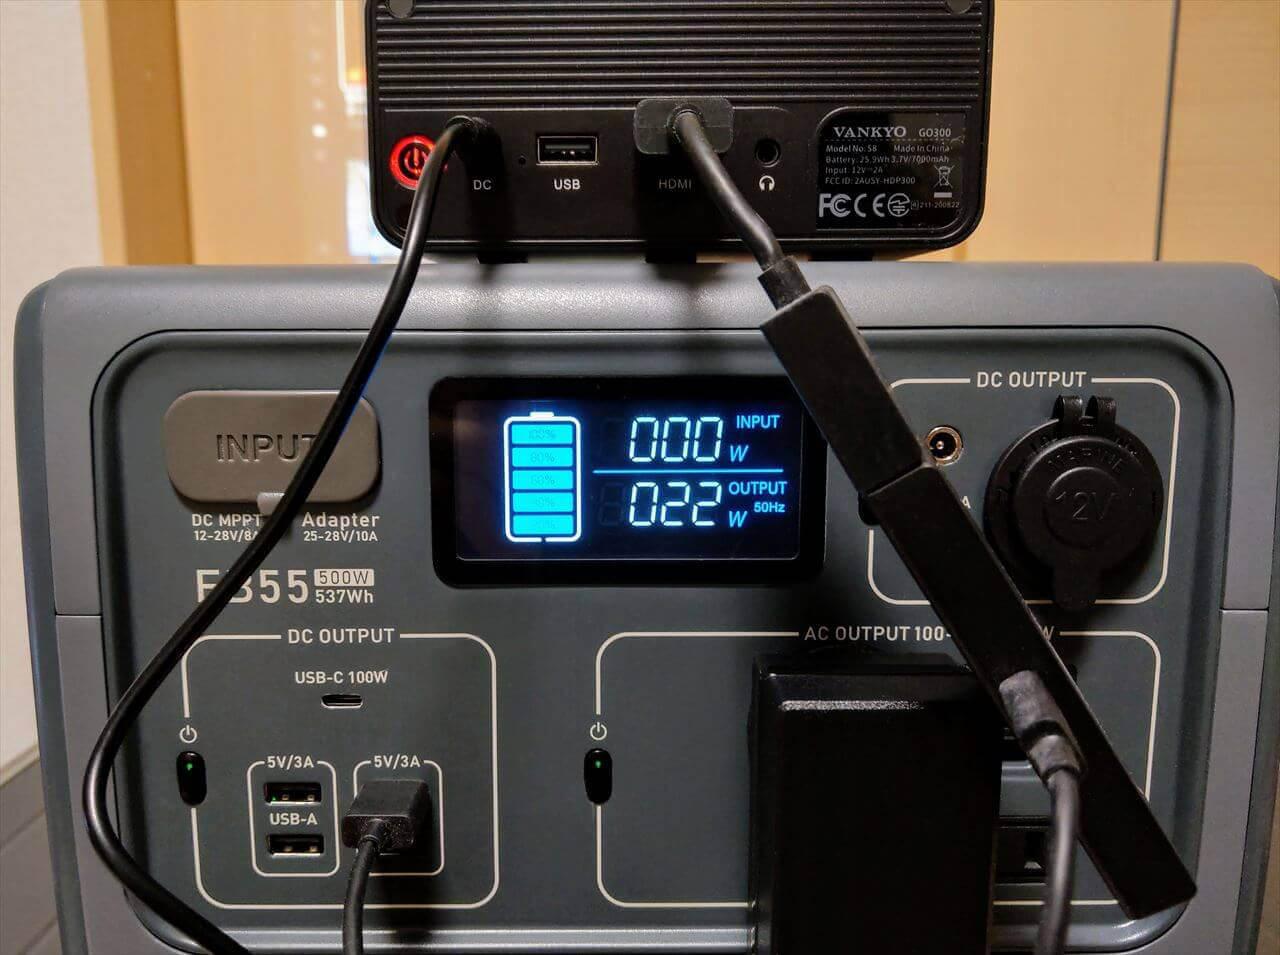 BLUETTI ポータブル電源 EB55でモバイルプロジェクターを再生中の消費電力